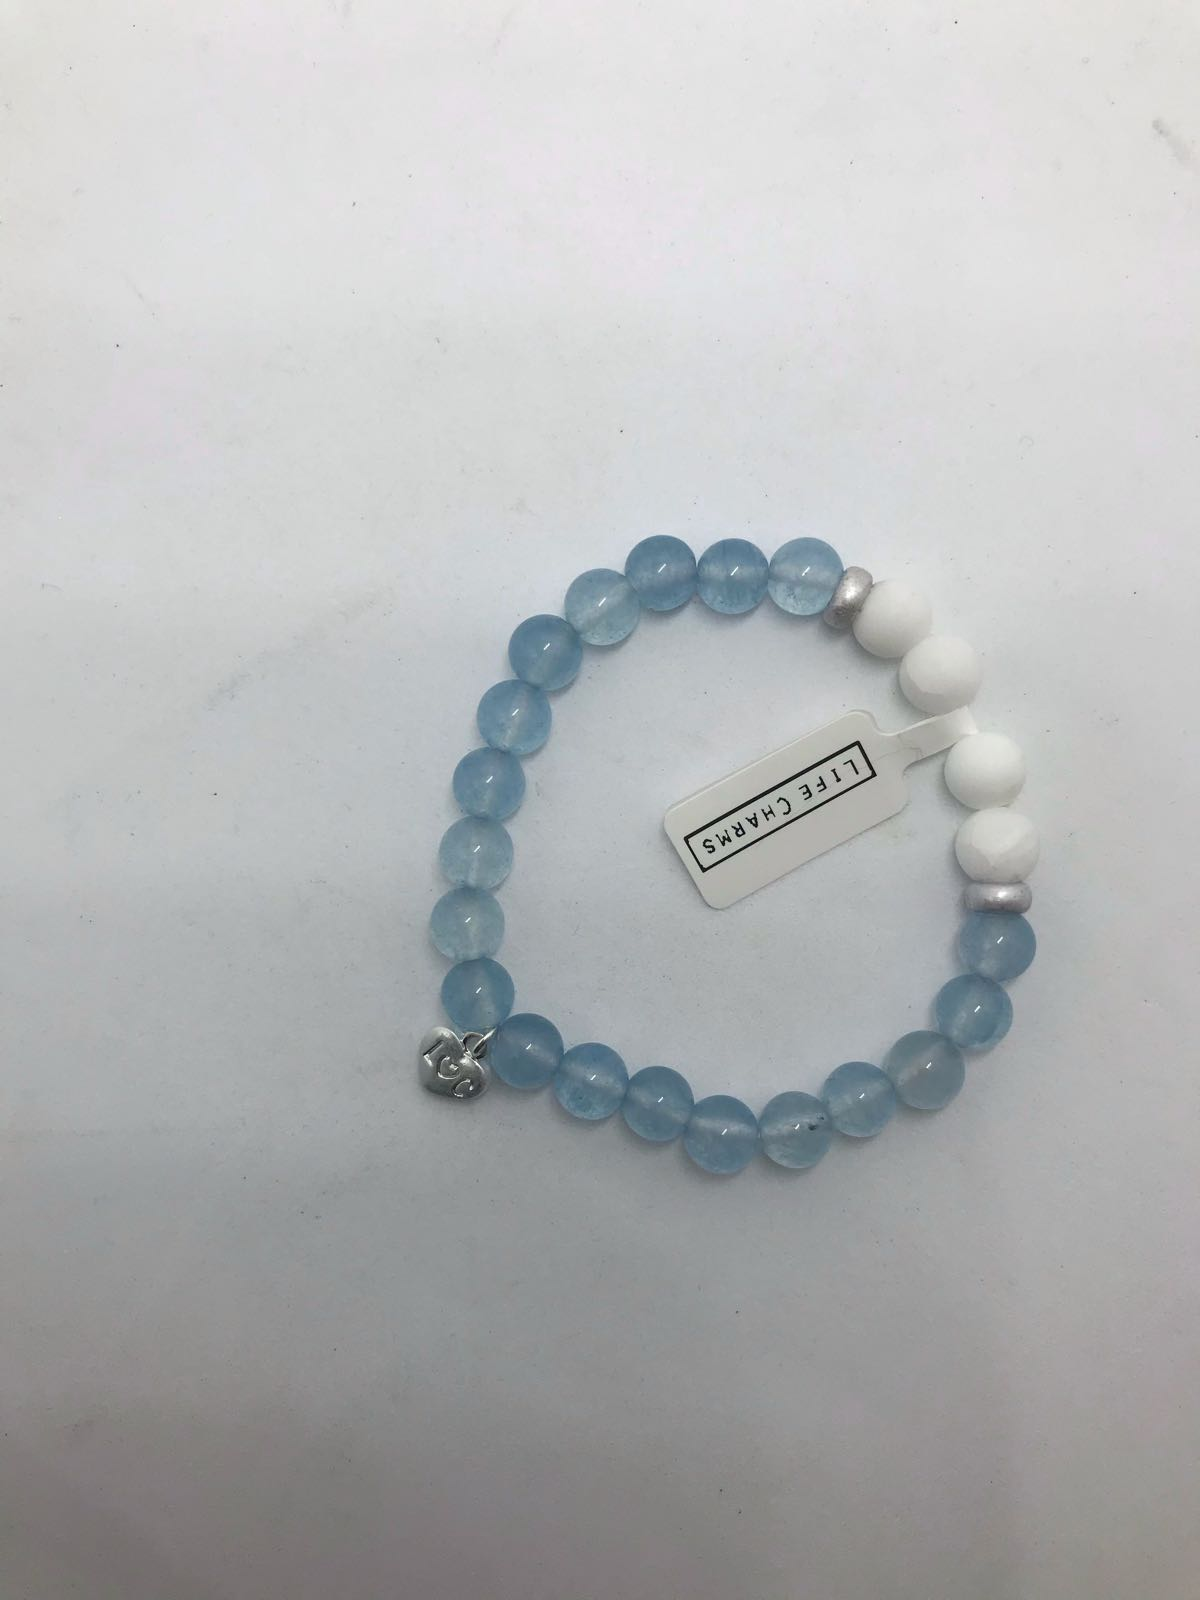 Life Charms aqua and white bracelet